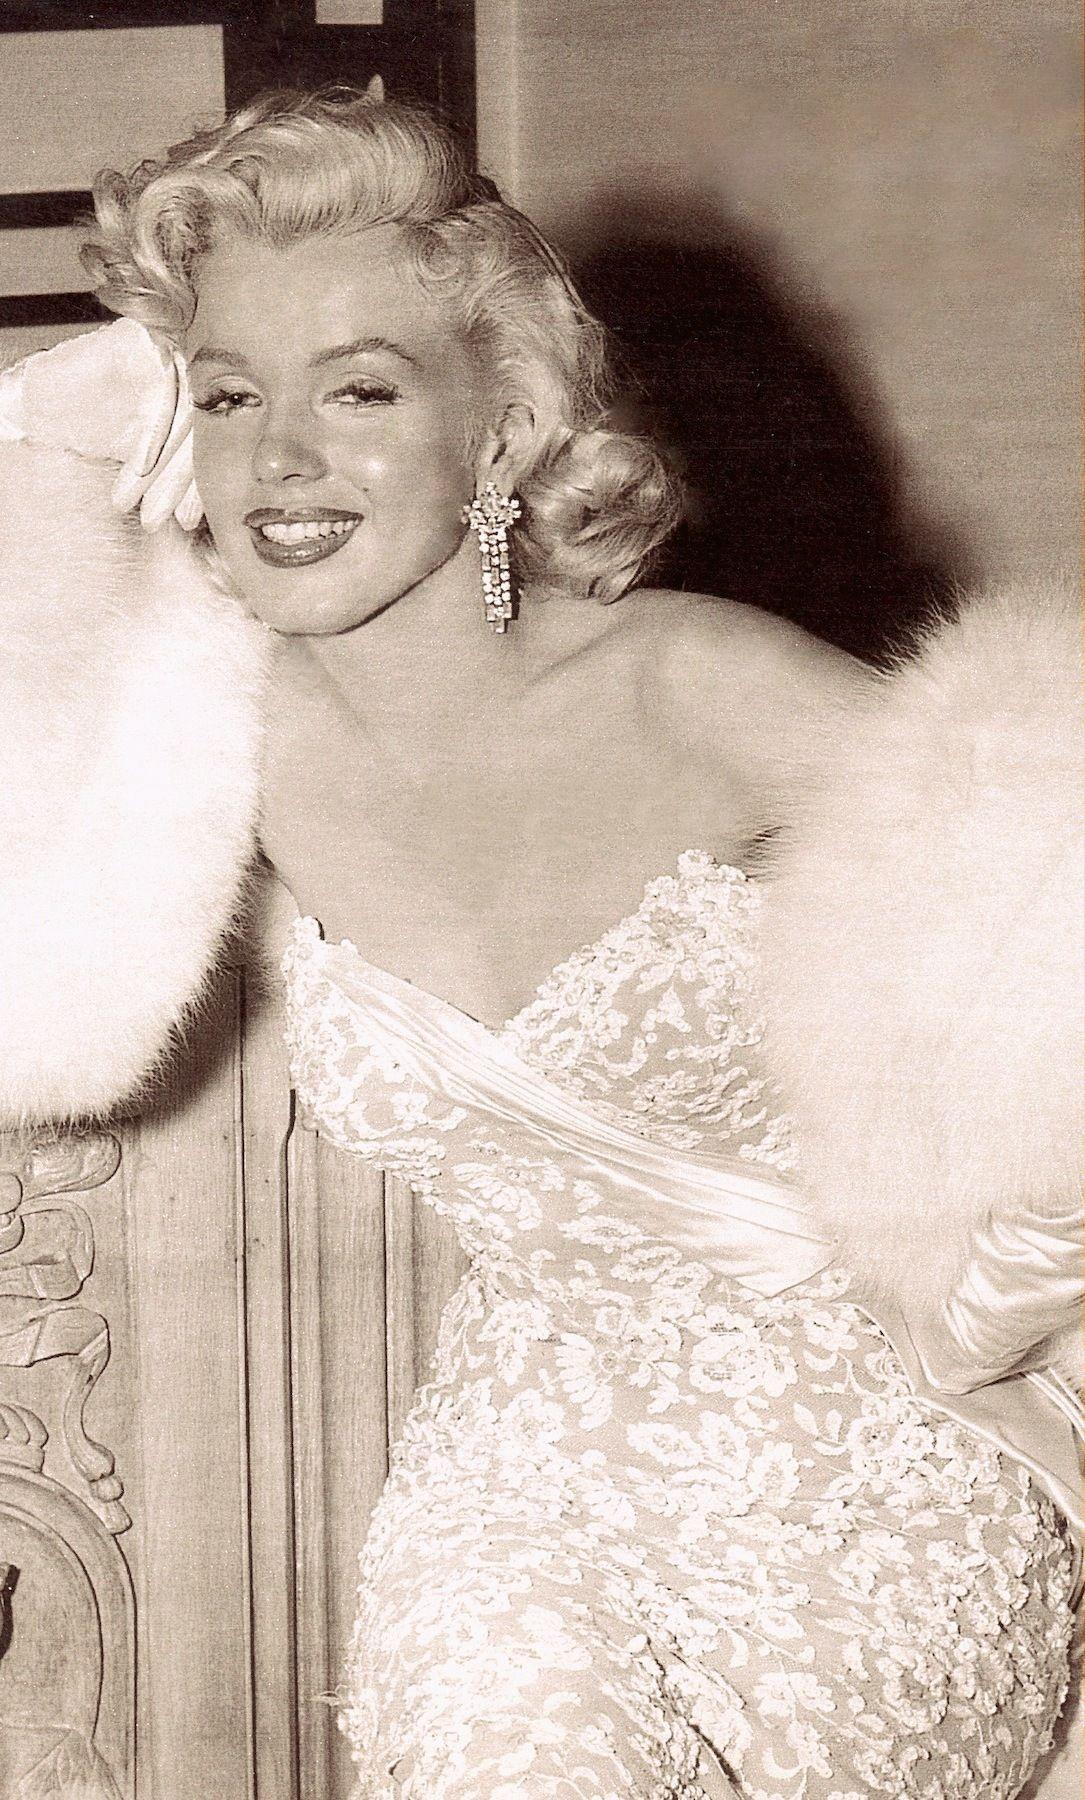 MARILYN MONROE  photo detail from GENTE MESE Hollywood anno X111 Marzo 1998. Milano Italy. (please follow minkshmink on pinterest) #marilynmonroe